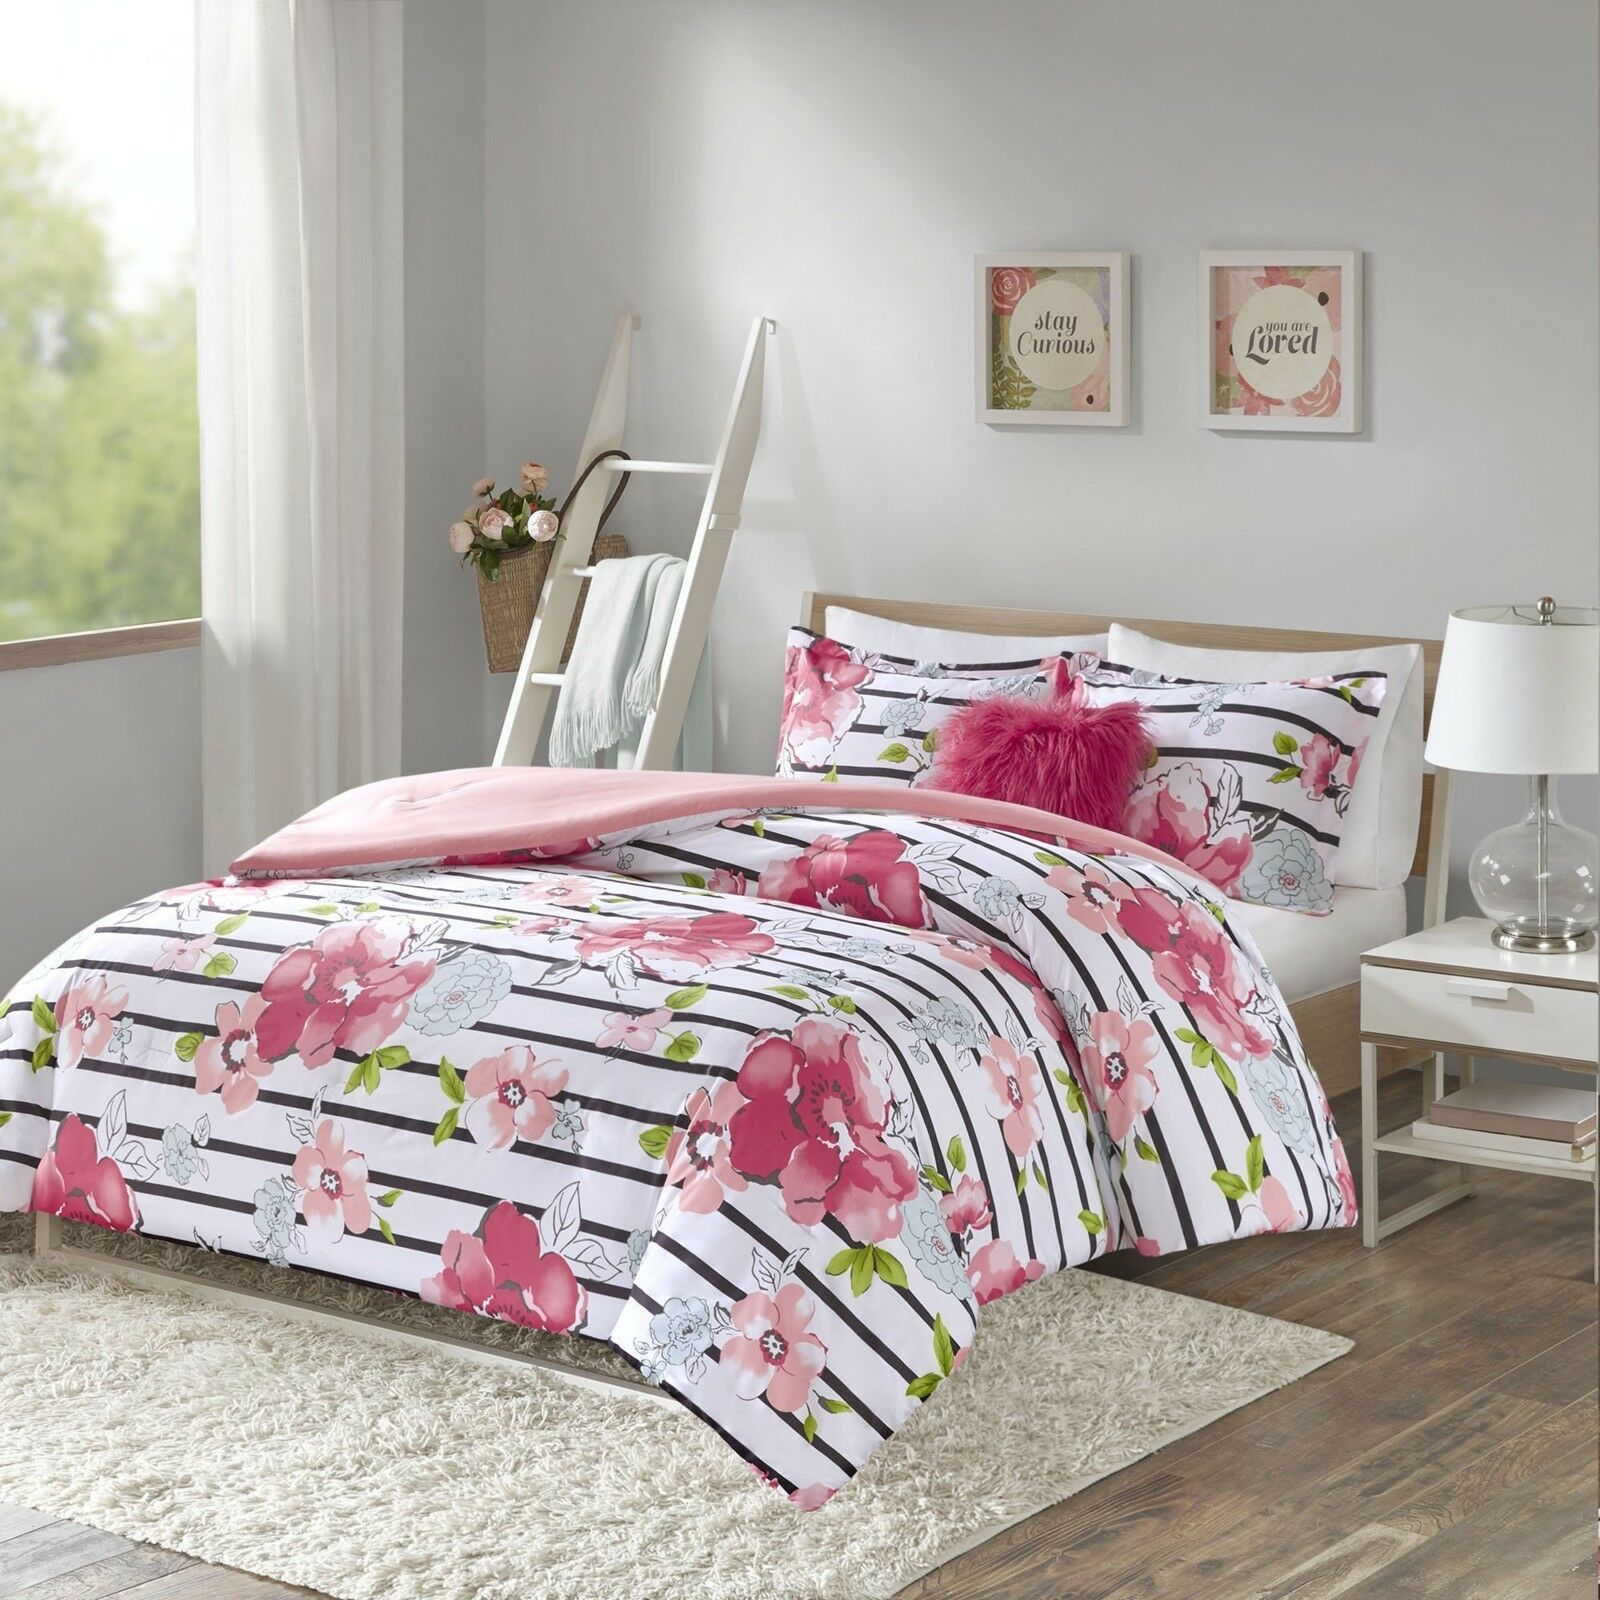 Teen Vogue Comforter Set Twin Spice Market Pink For Sale Online Ebay